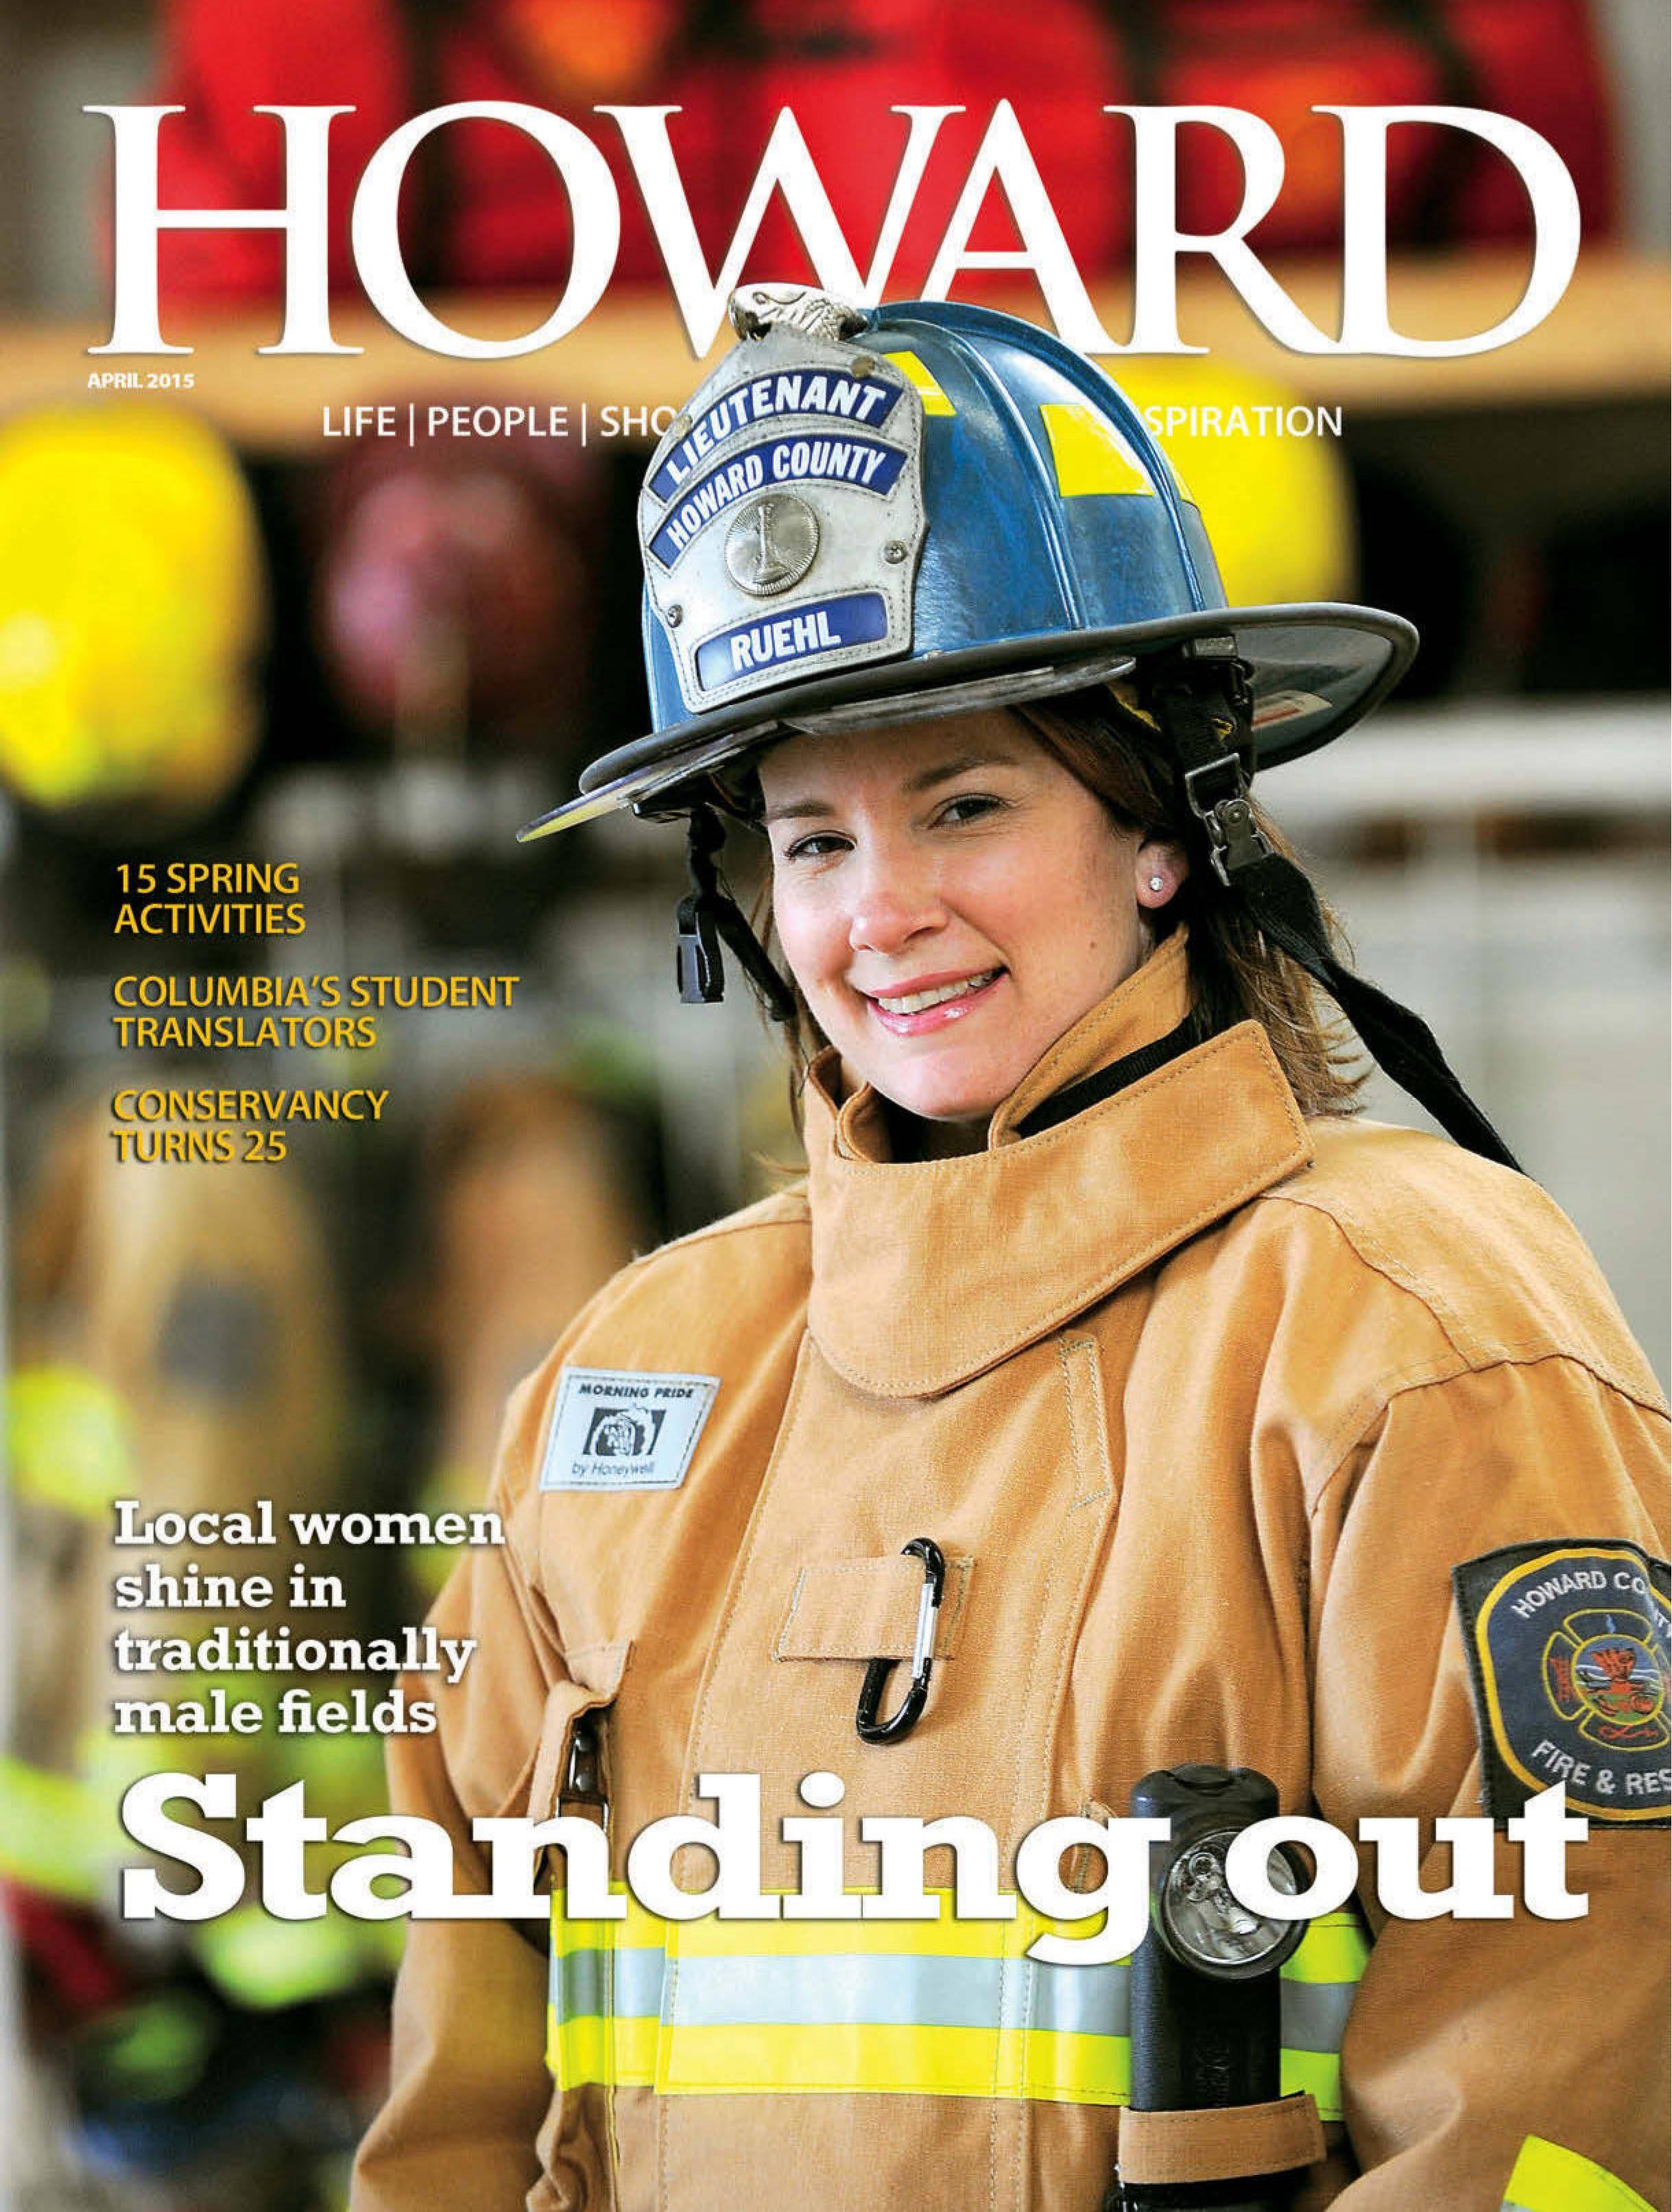 Howard Magazine - April 2015